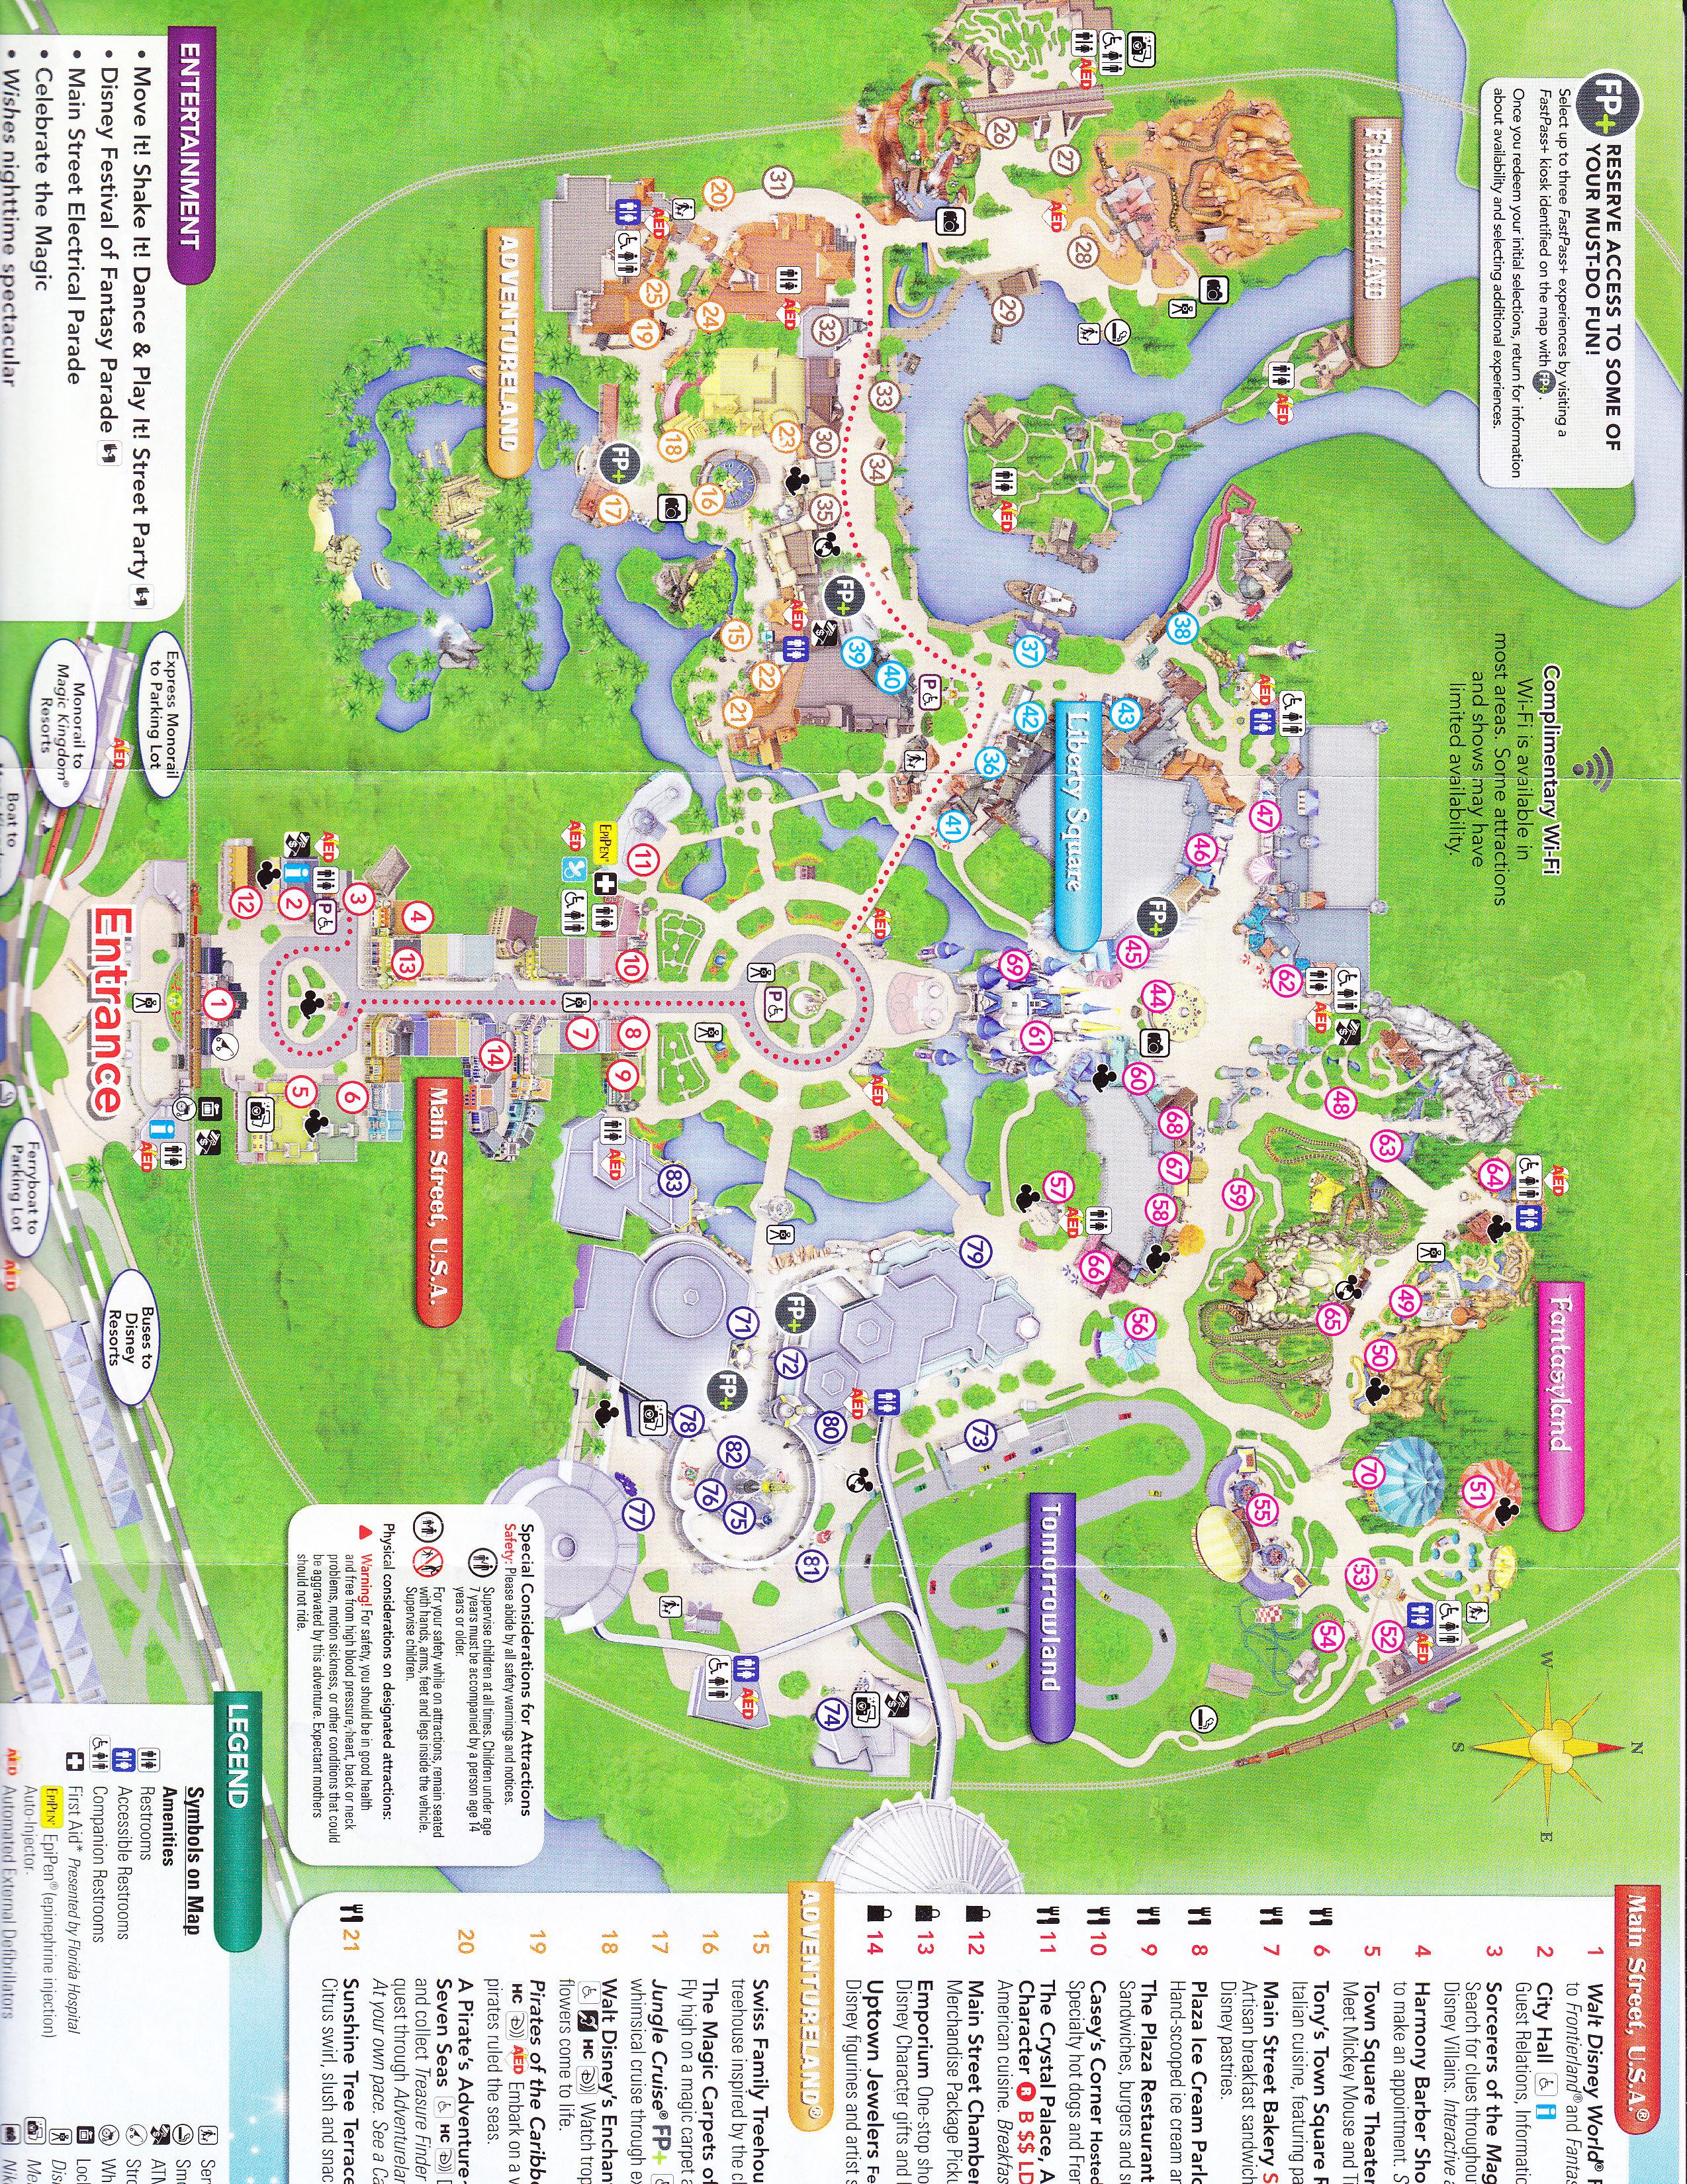 Adventureland Disney World Map.Magic Kingdom At Walt Disney World 2016 Park Map